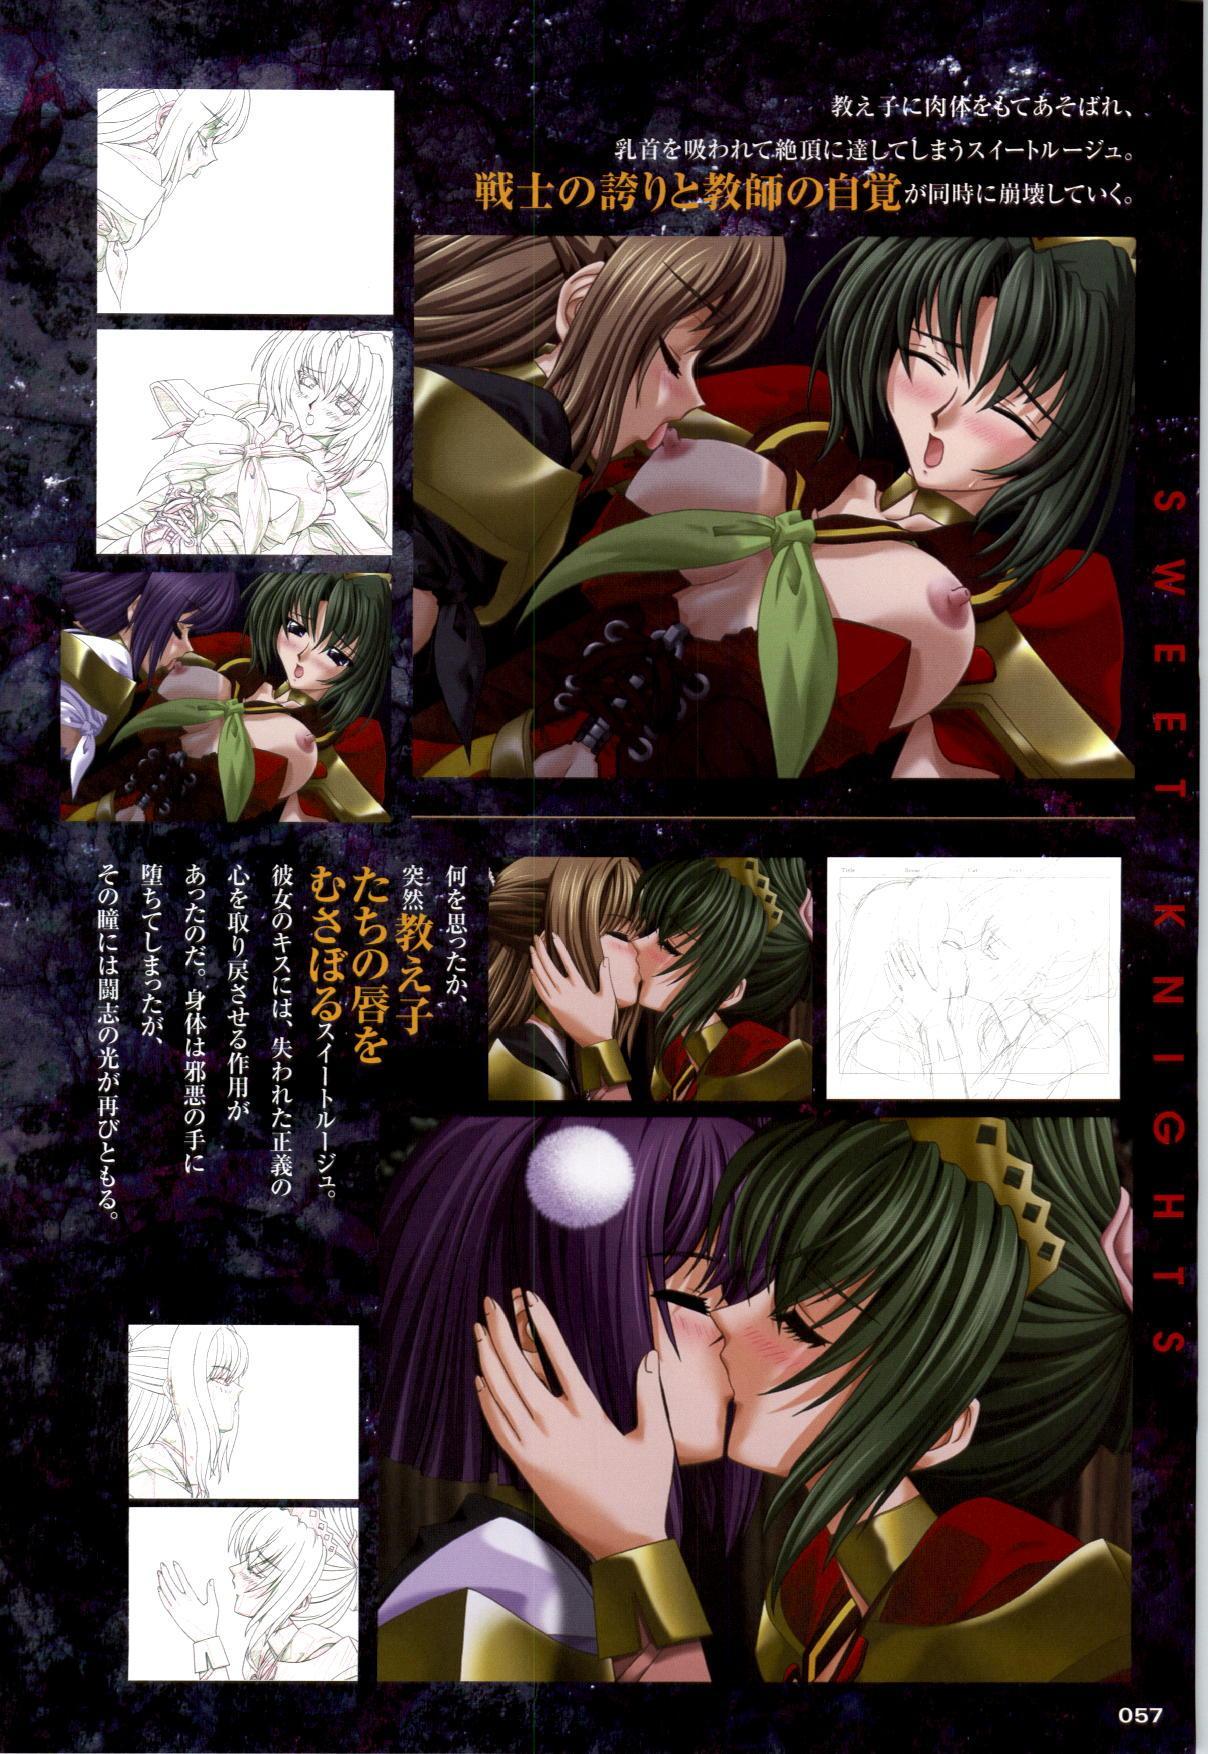 Mahou Senshi Sweet Knight & Mahou Senshi Princess Tear 56